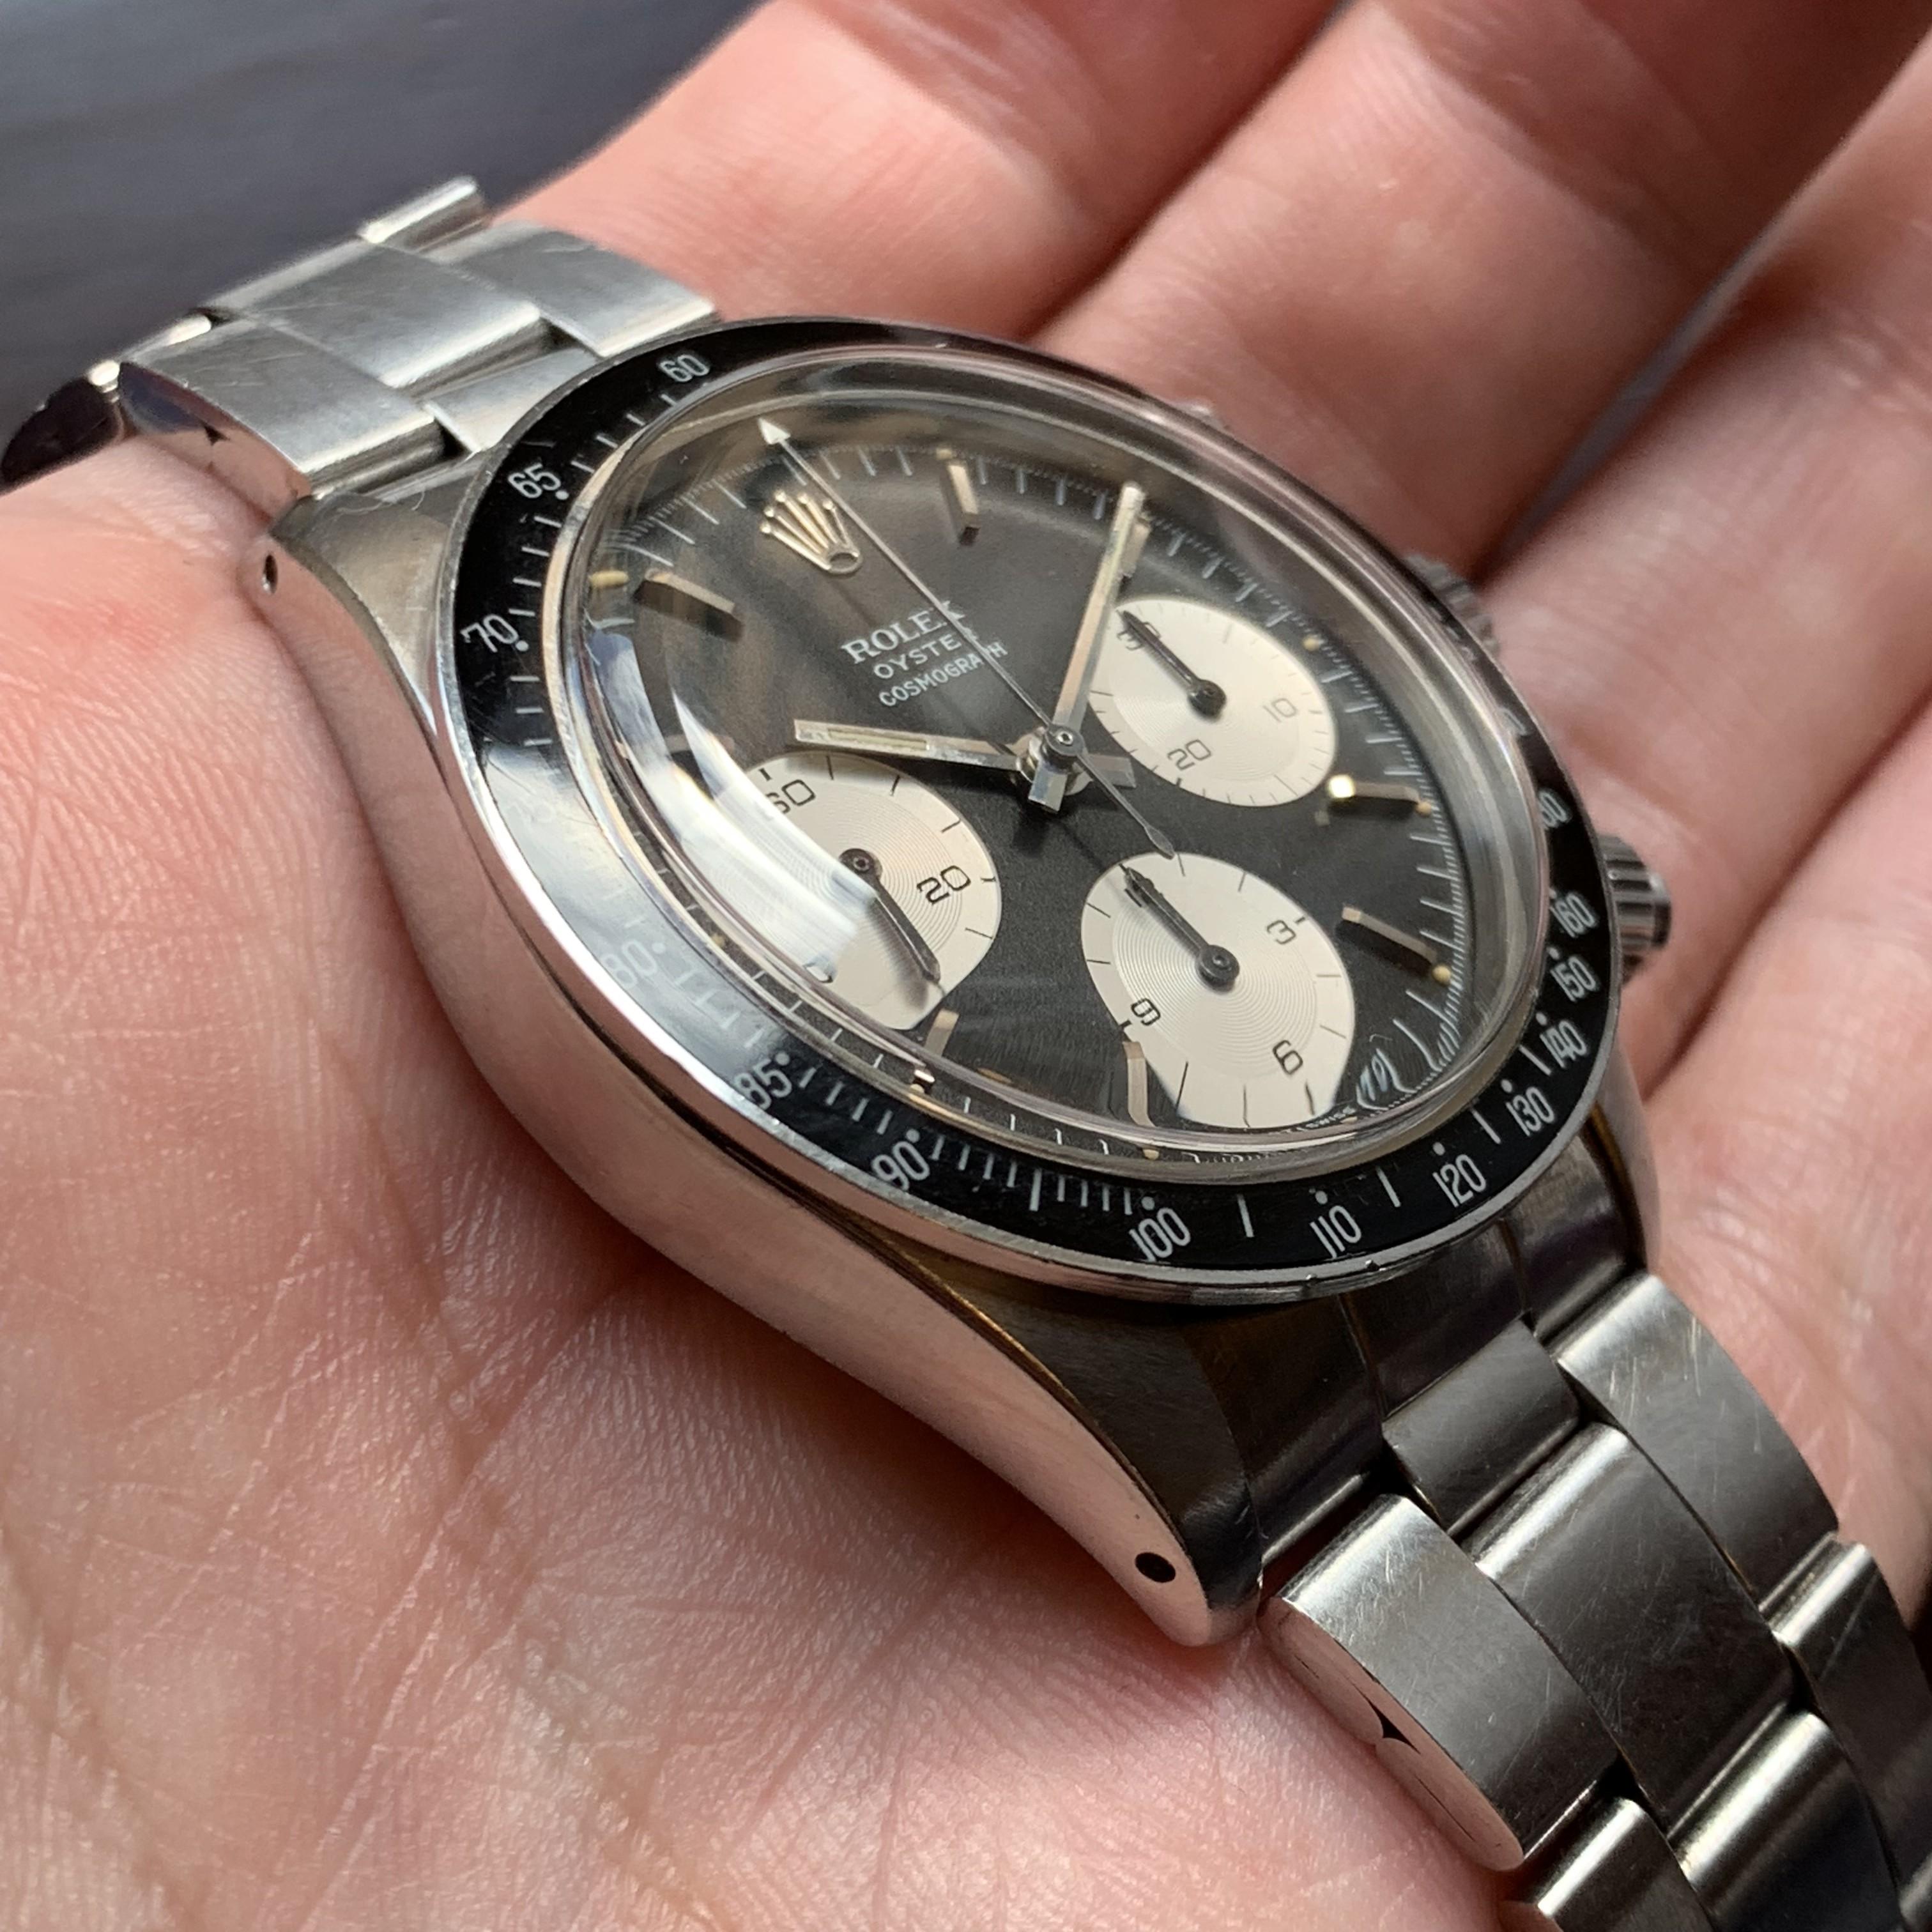 Rolex Ref 6263 sigma MK1 Box and Papers Circa 1972 Status Sold